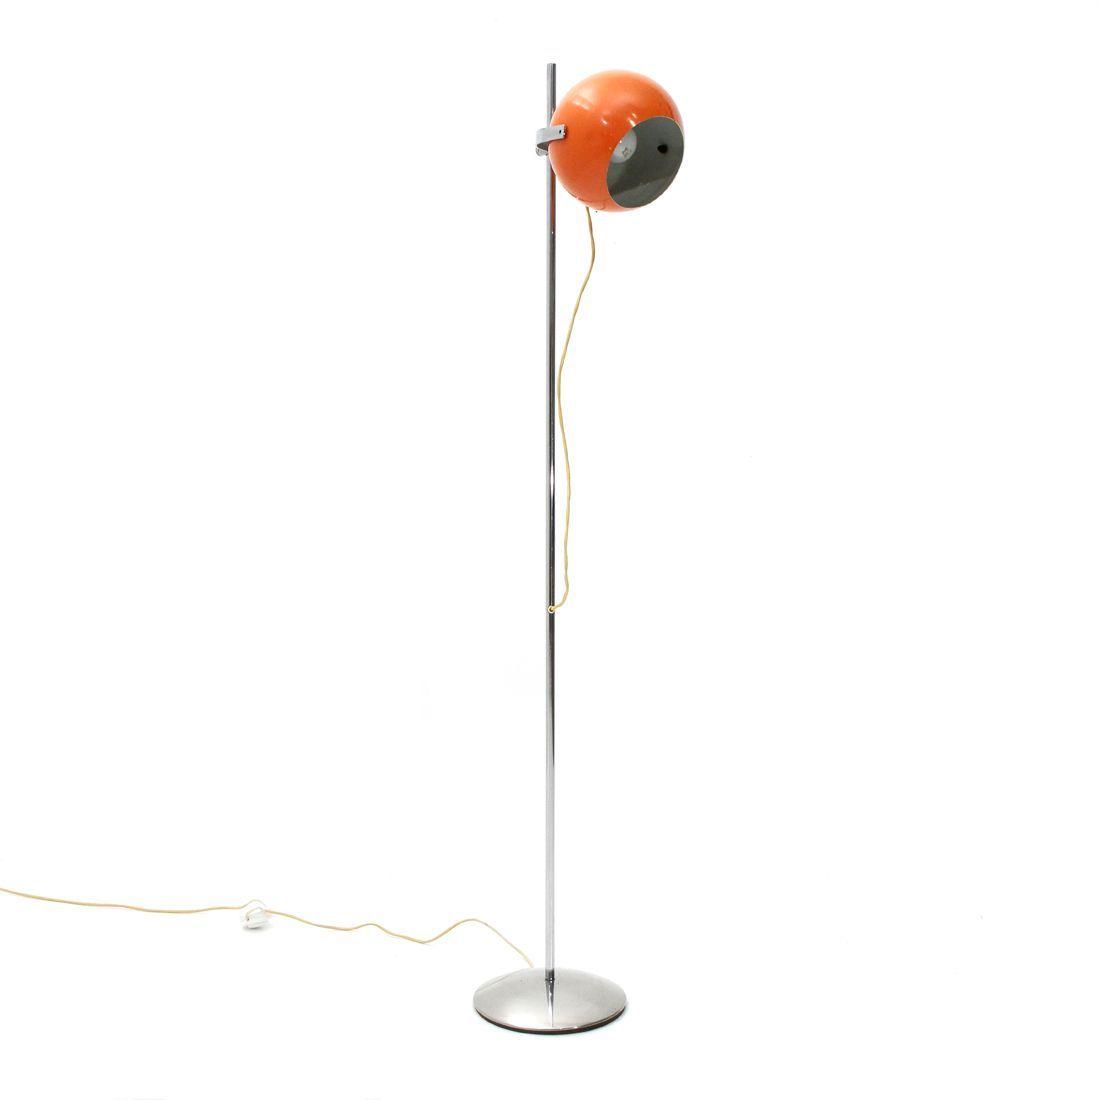 Led Stehlampe Dimmbar Schwarz Led Deckenfluter Dimmbar